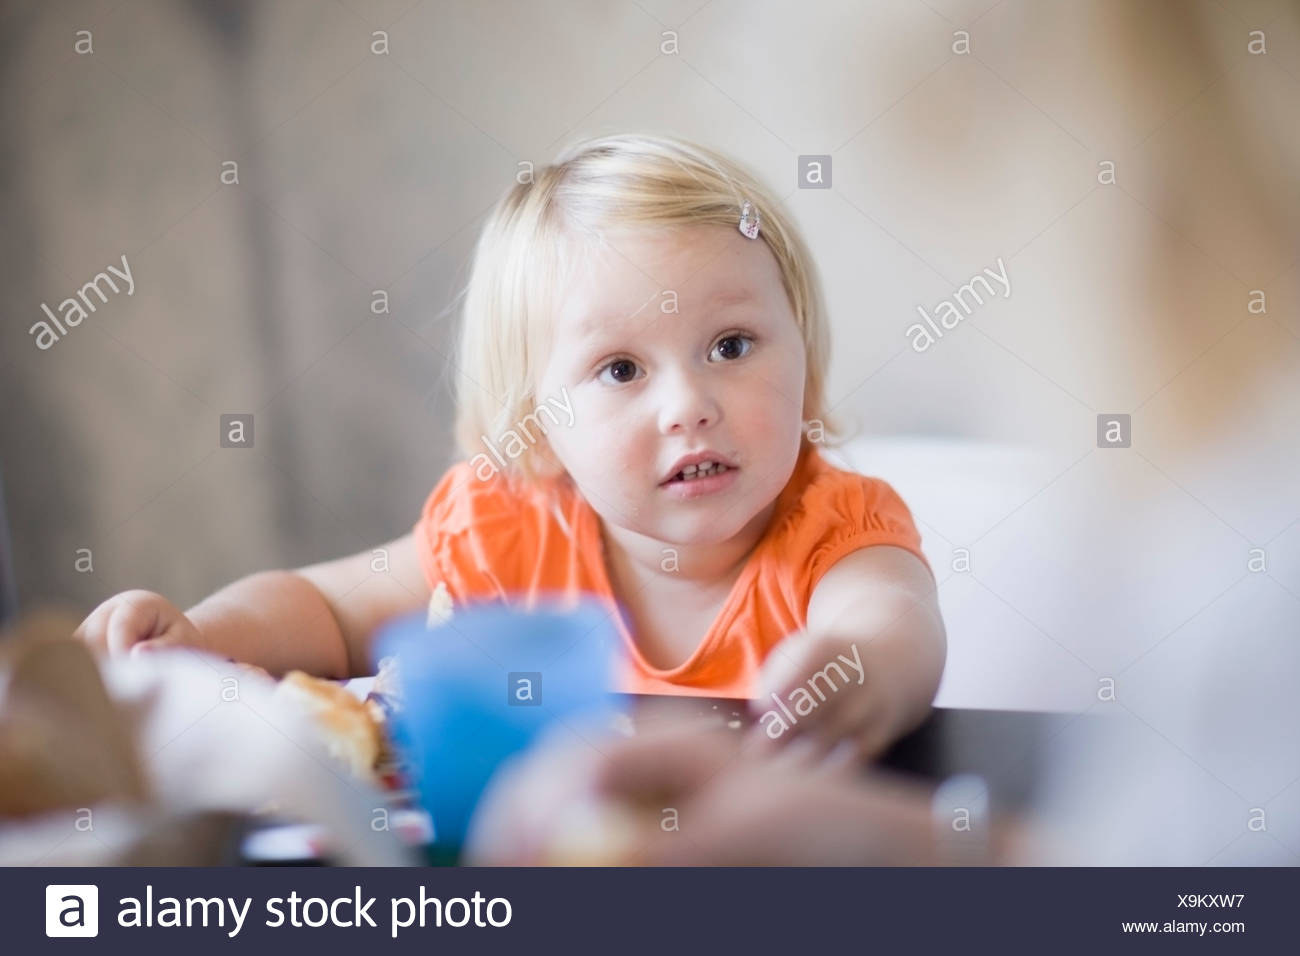 Toddler girl eating at dinner table - Stock Image